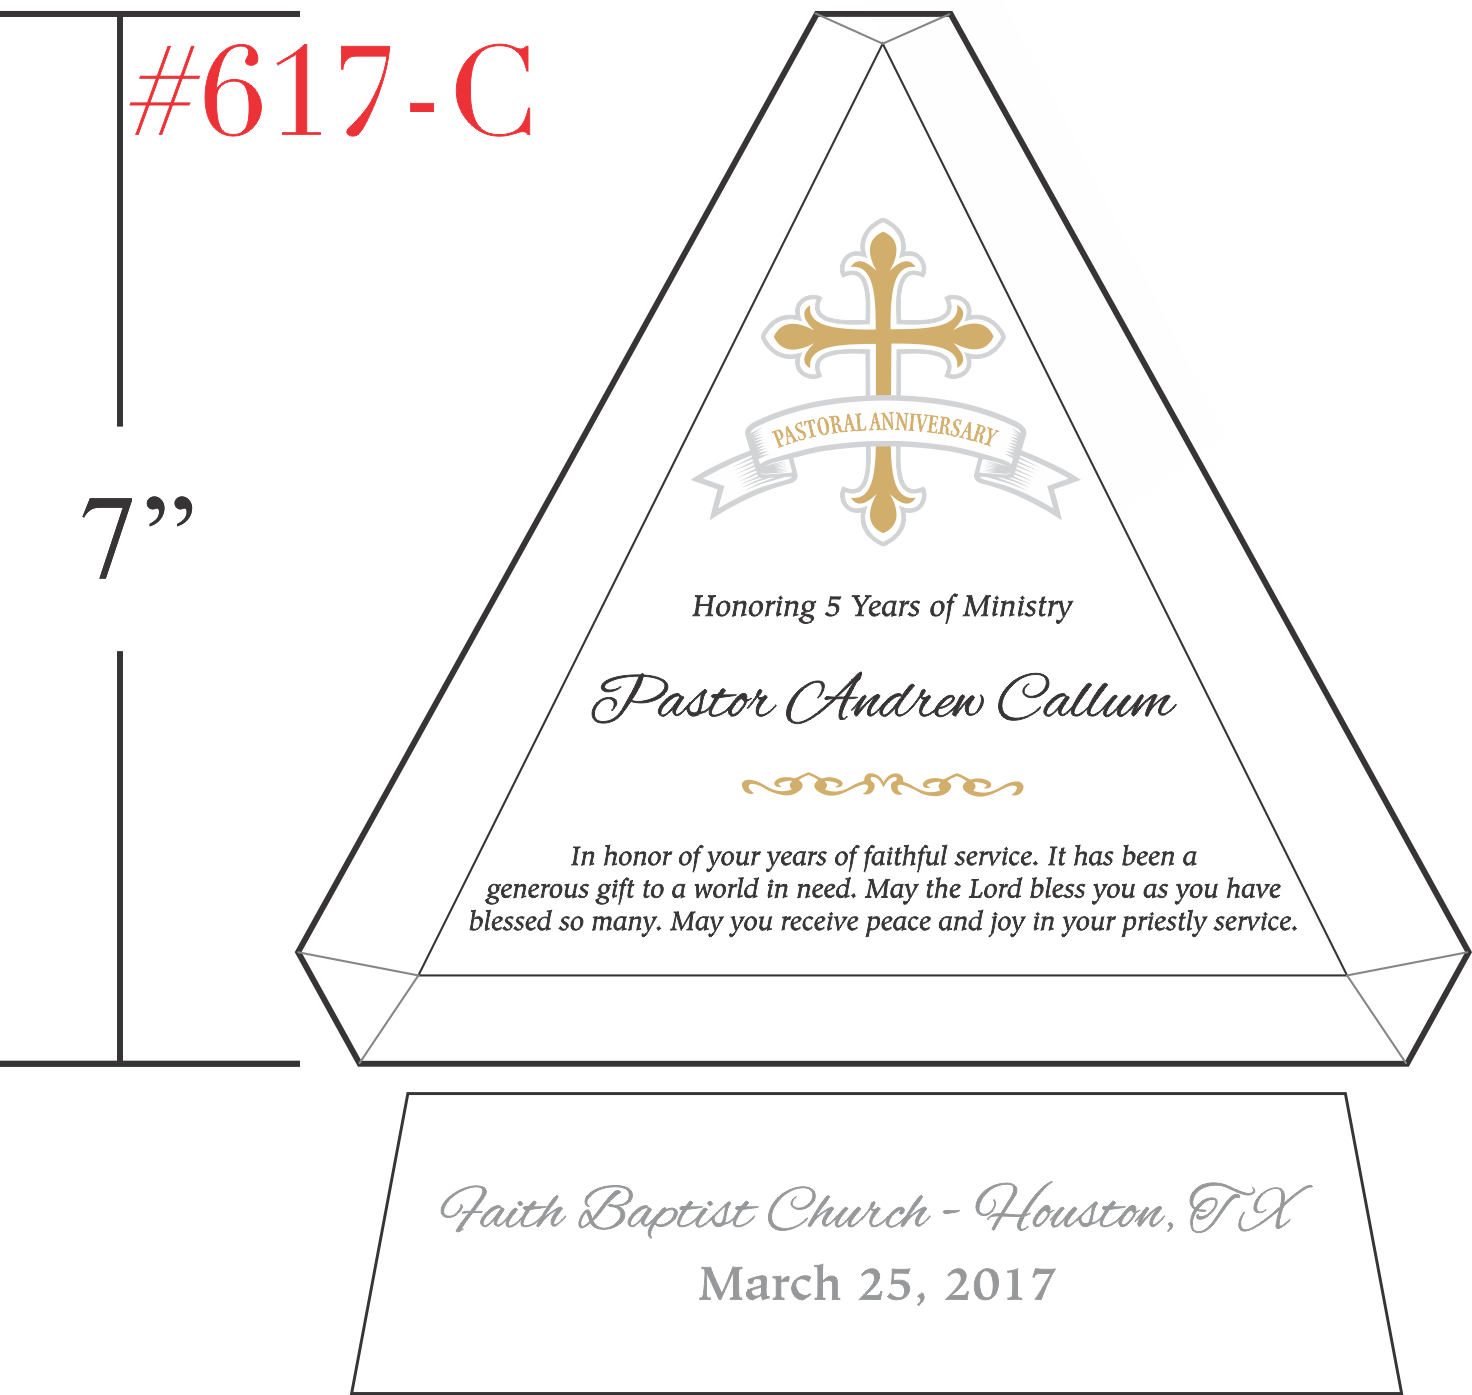 5 Years of Ministry Pastor Anniversary Gift